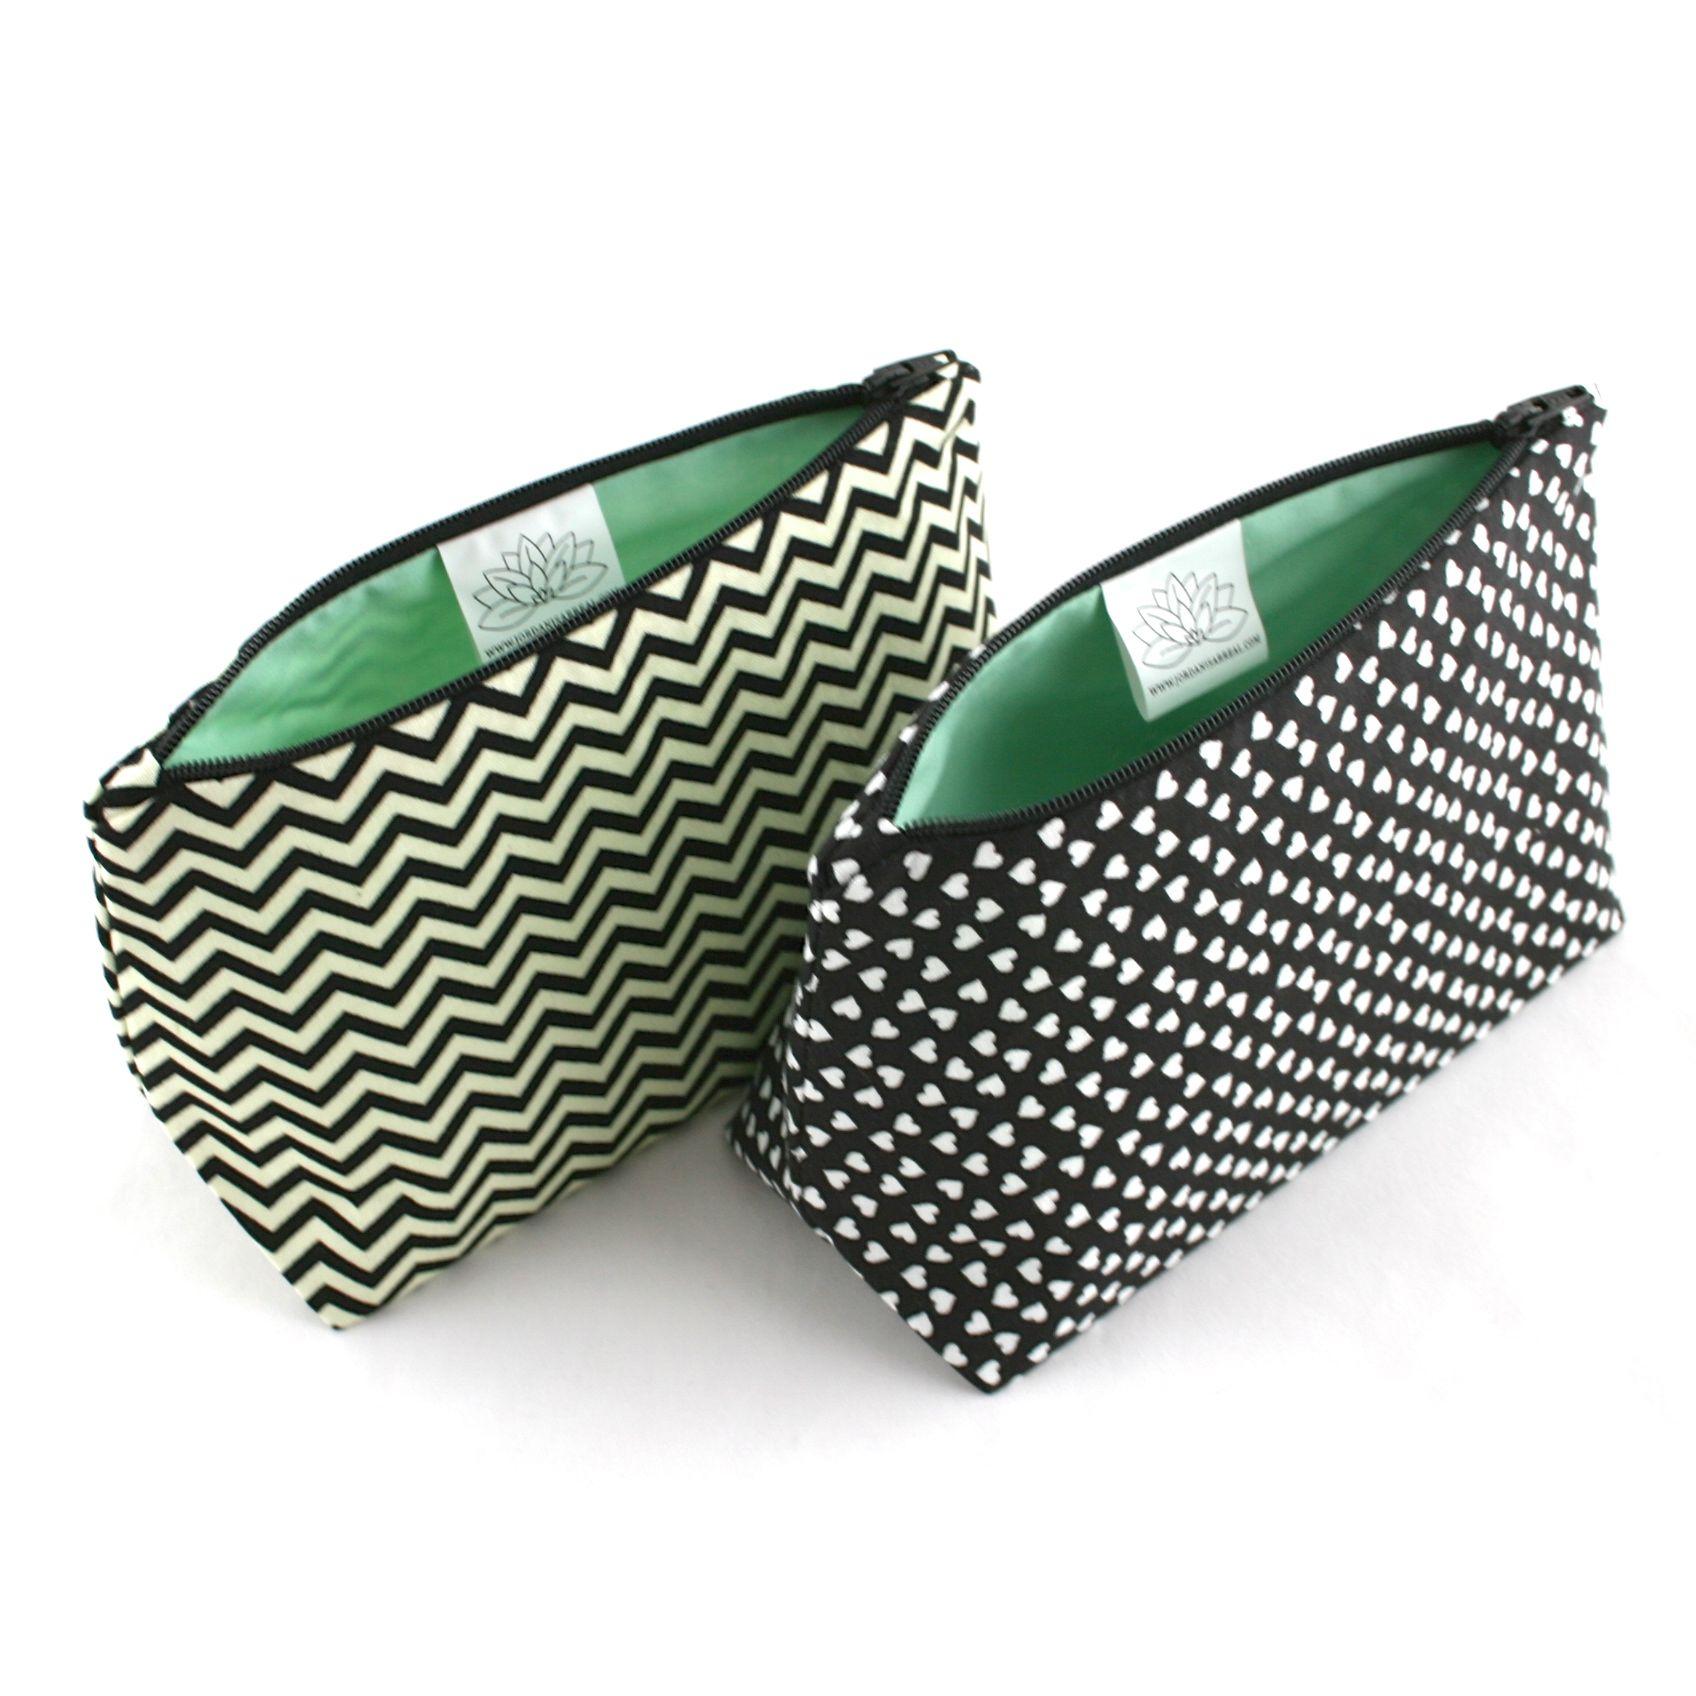 Black and White Coordinate Bags - Le Pique Nique by Jordani Sarreal 02.jpg